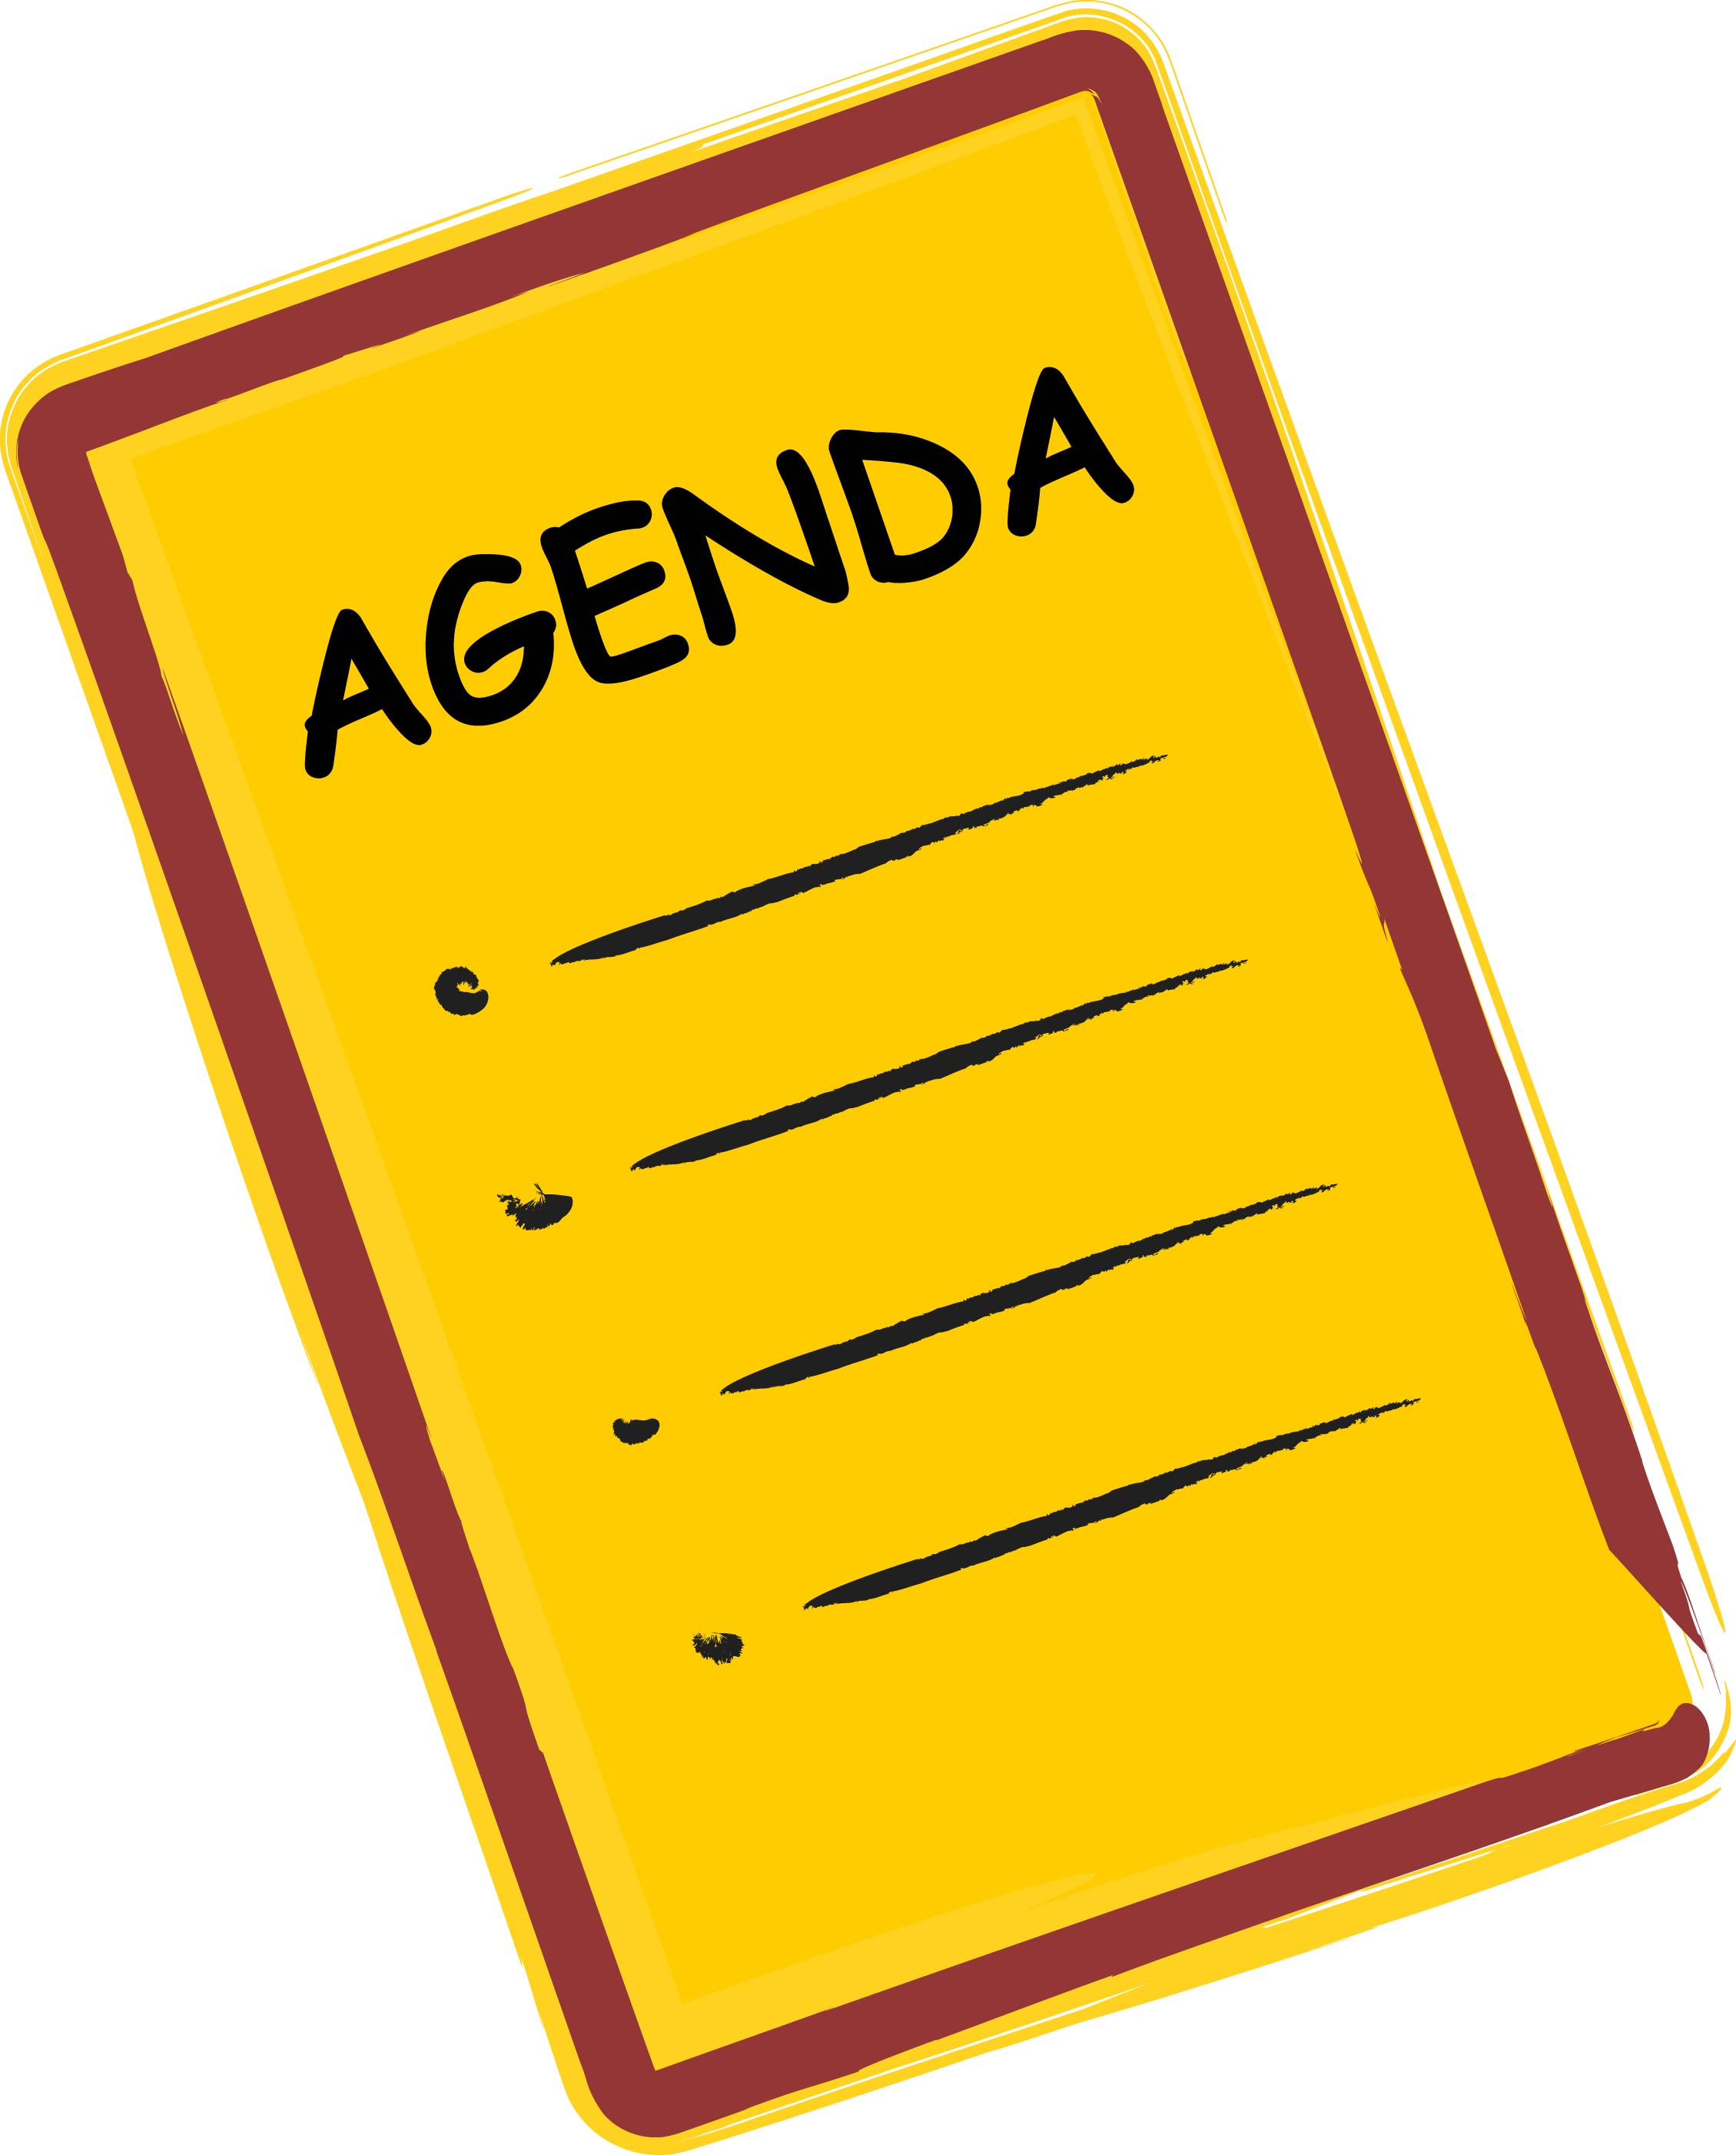 Agenda Clipart - Clipart Kid